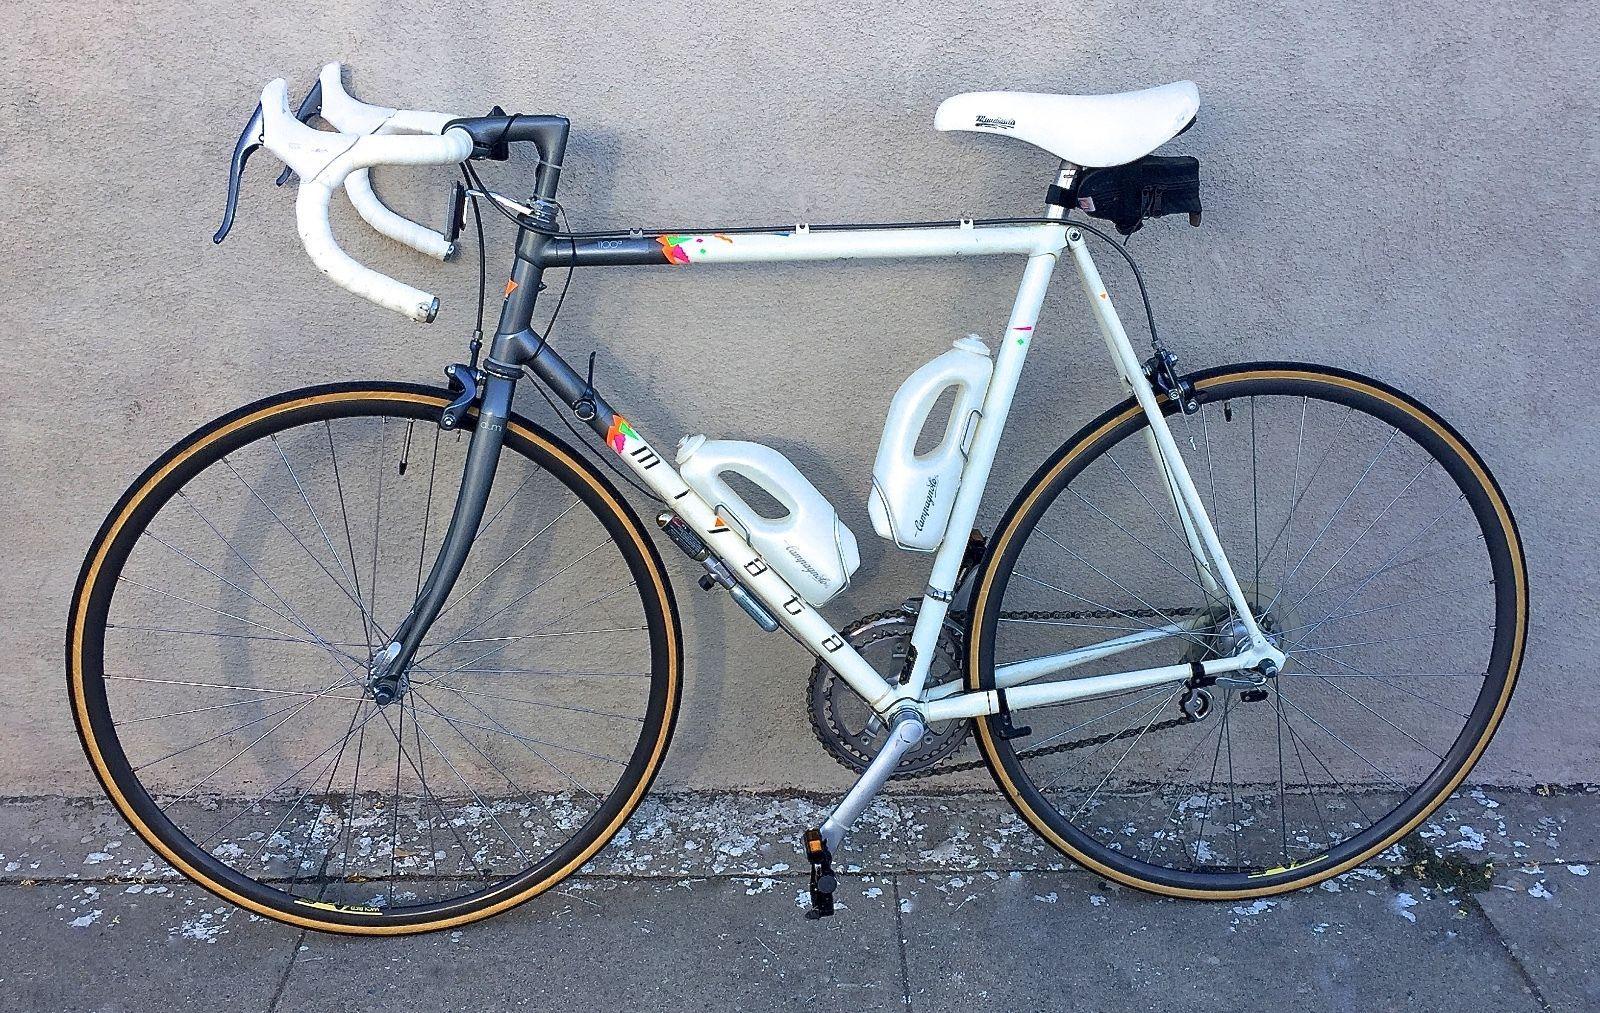 f872632fa97 Miyata 1100a Aluminum Frame Road Bike 80's Vintage 14 Speed Refurbished!  #vintage #speed #refurbished #bike #road #aluminum #frame #miyata